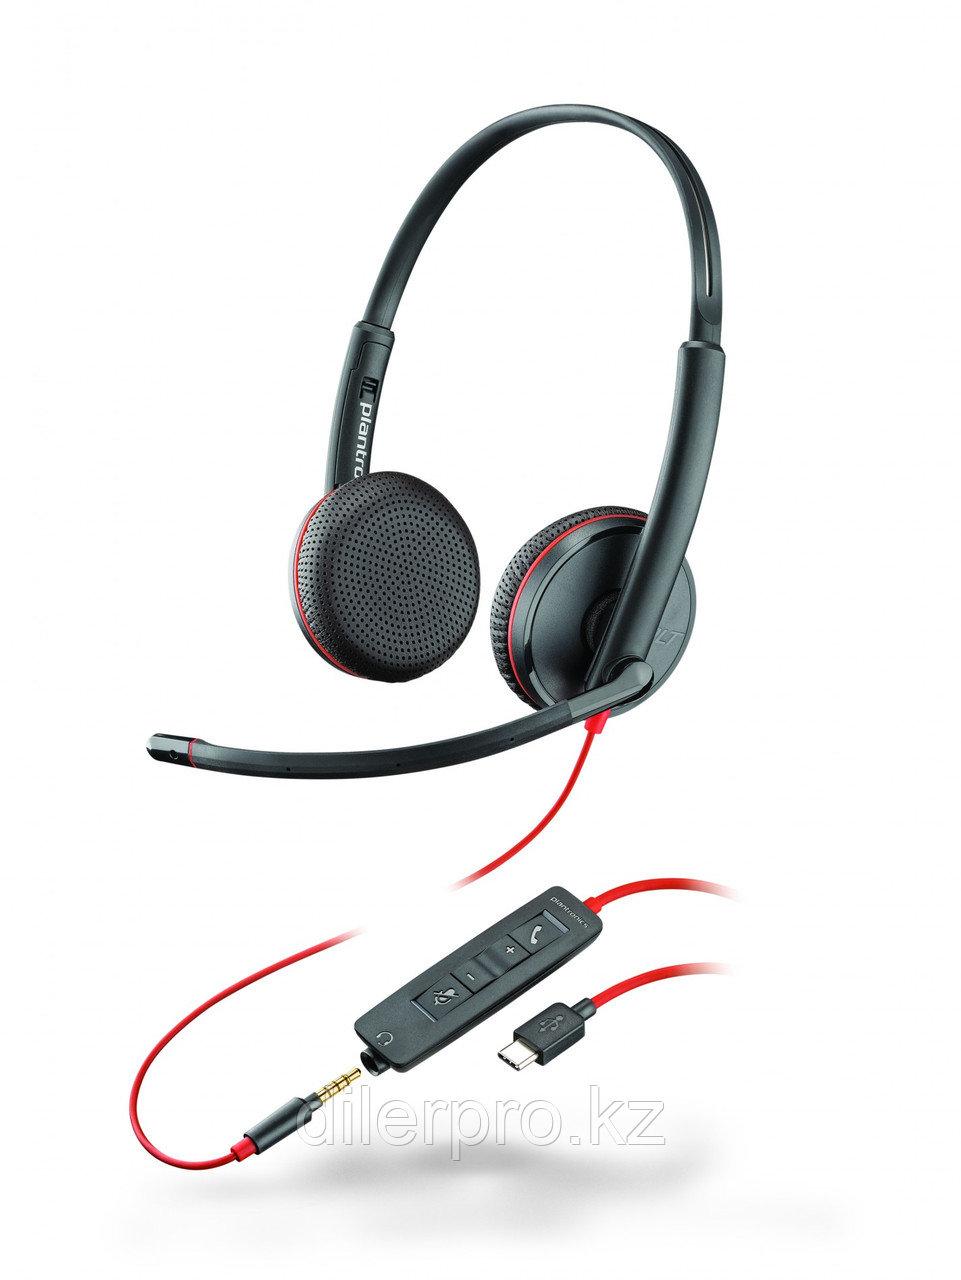 Plantronics BlackWire C3225-C - проводная гарнитура (стерео, jack 3.5/USB-C)